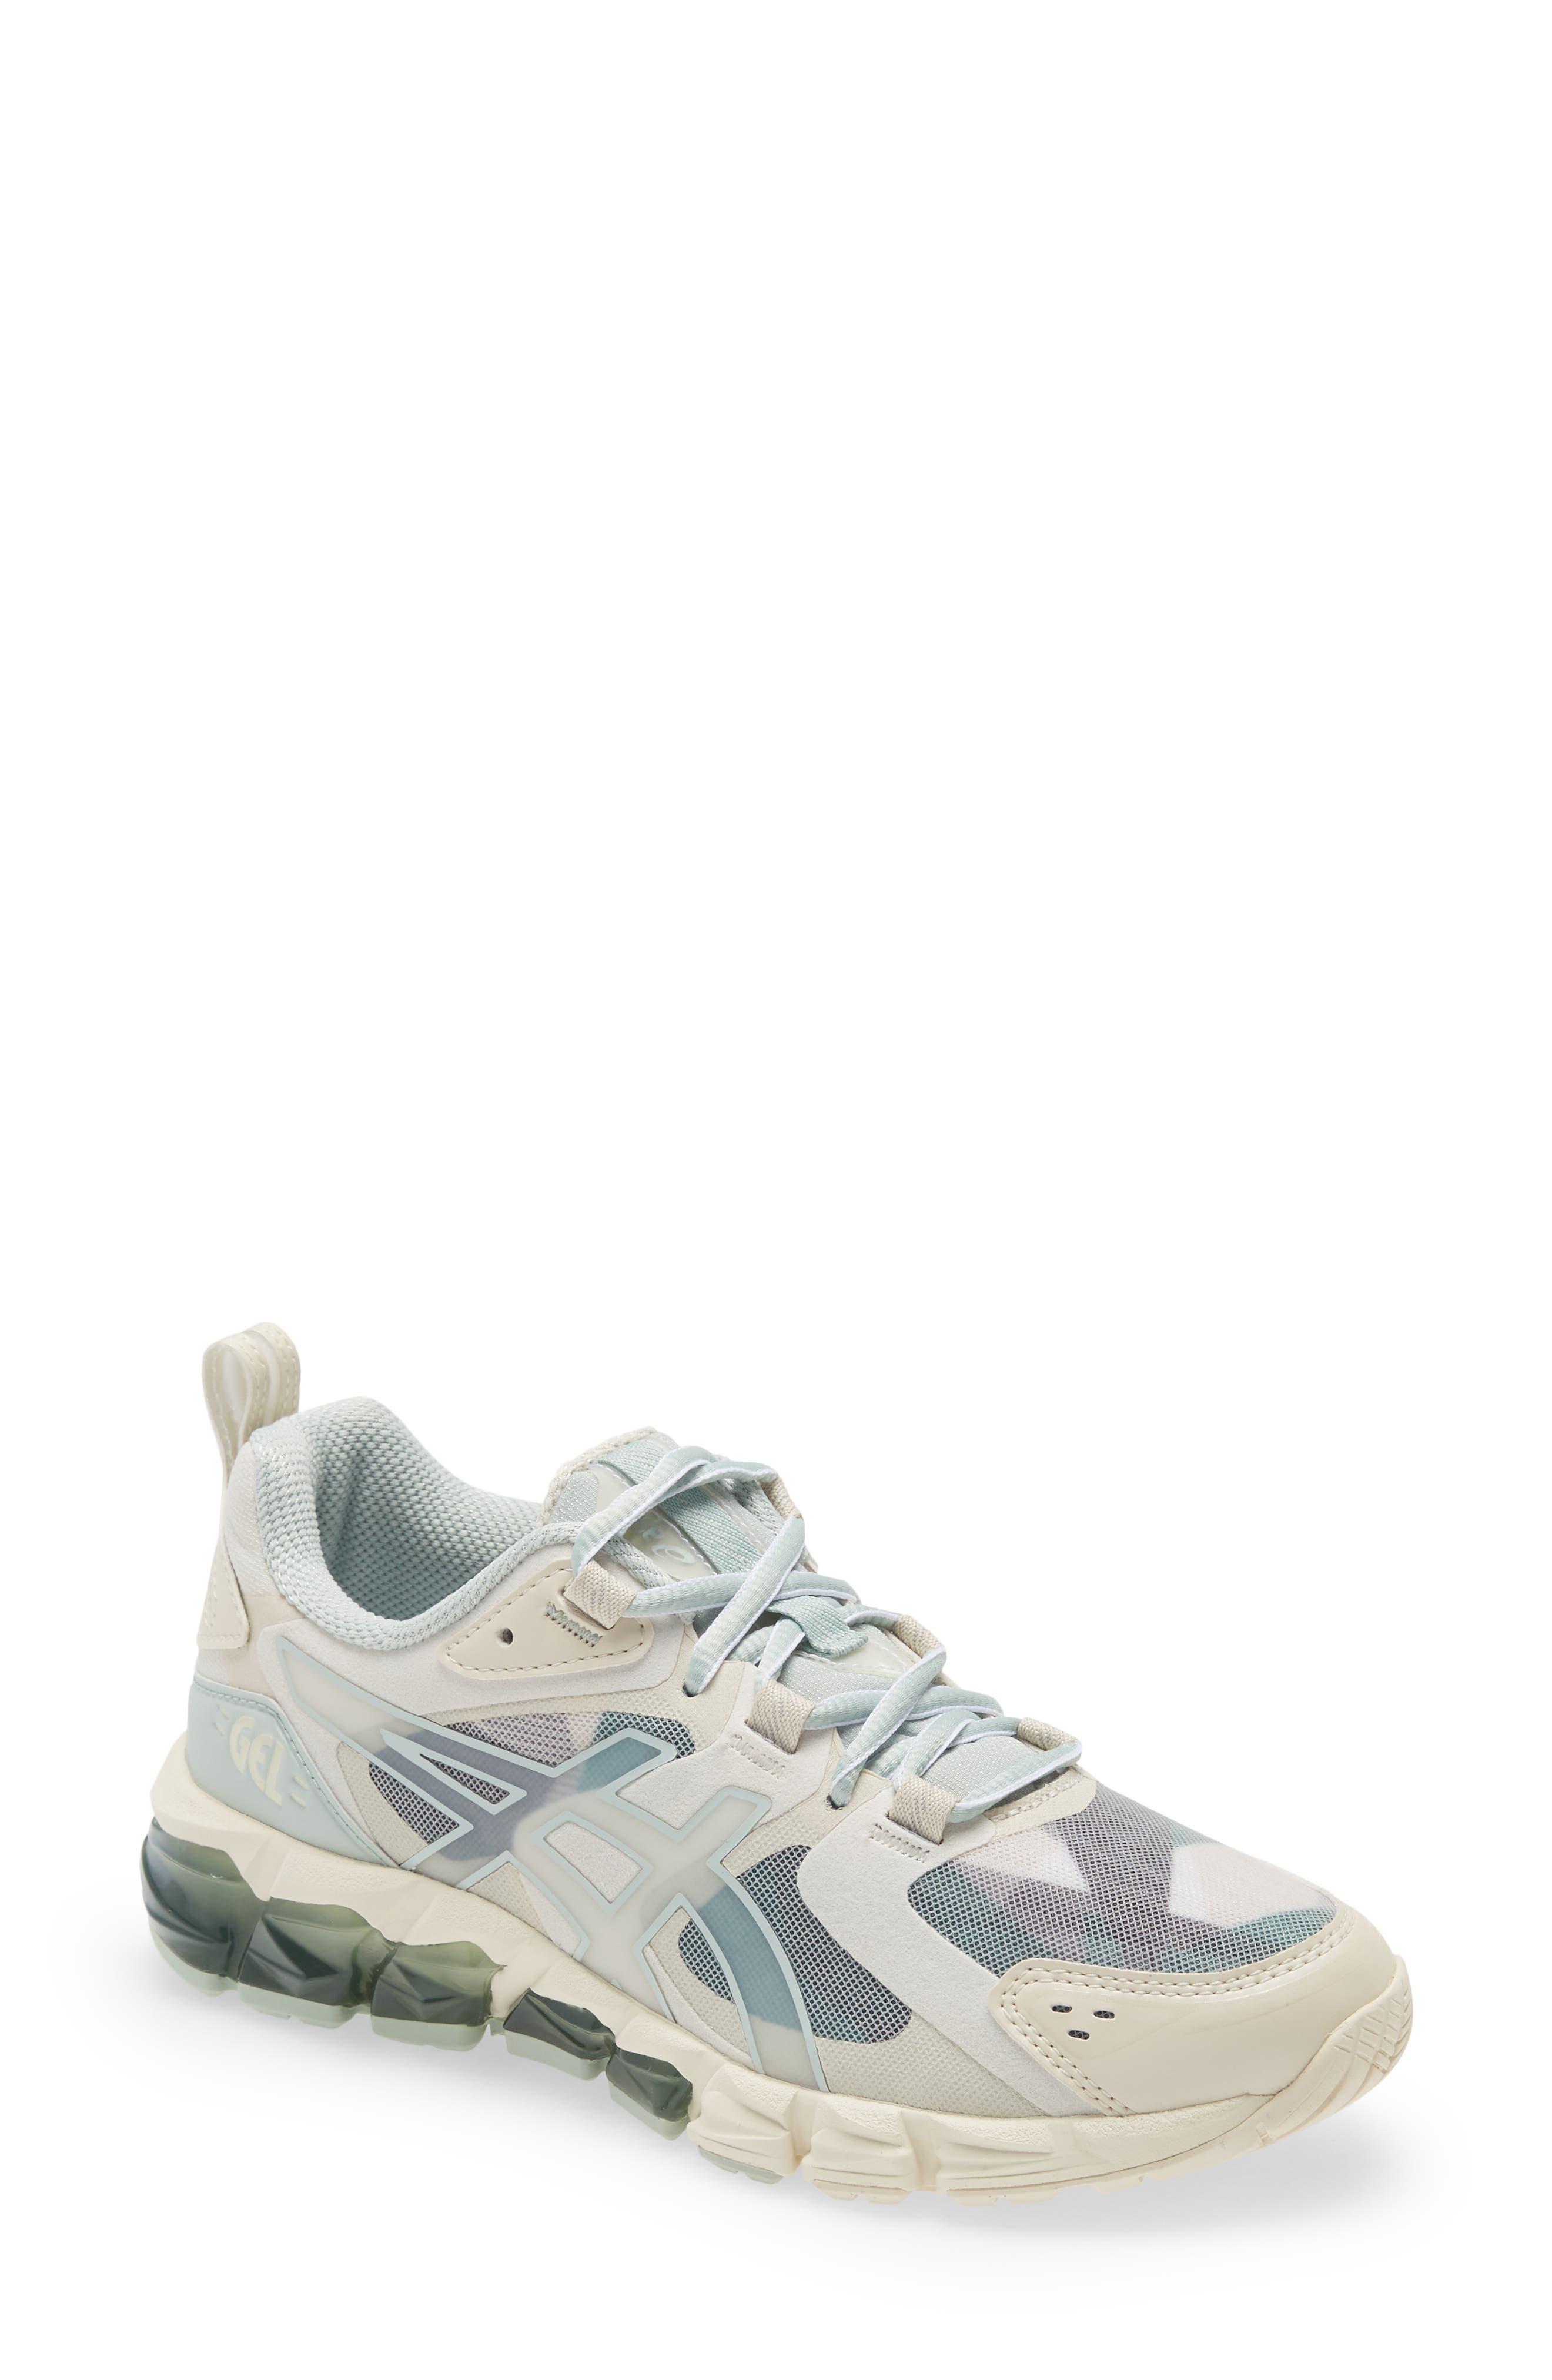 Women's Asics Gel-Quantum 180 6 Sneaker